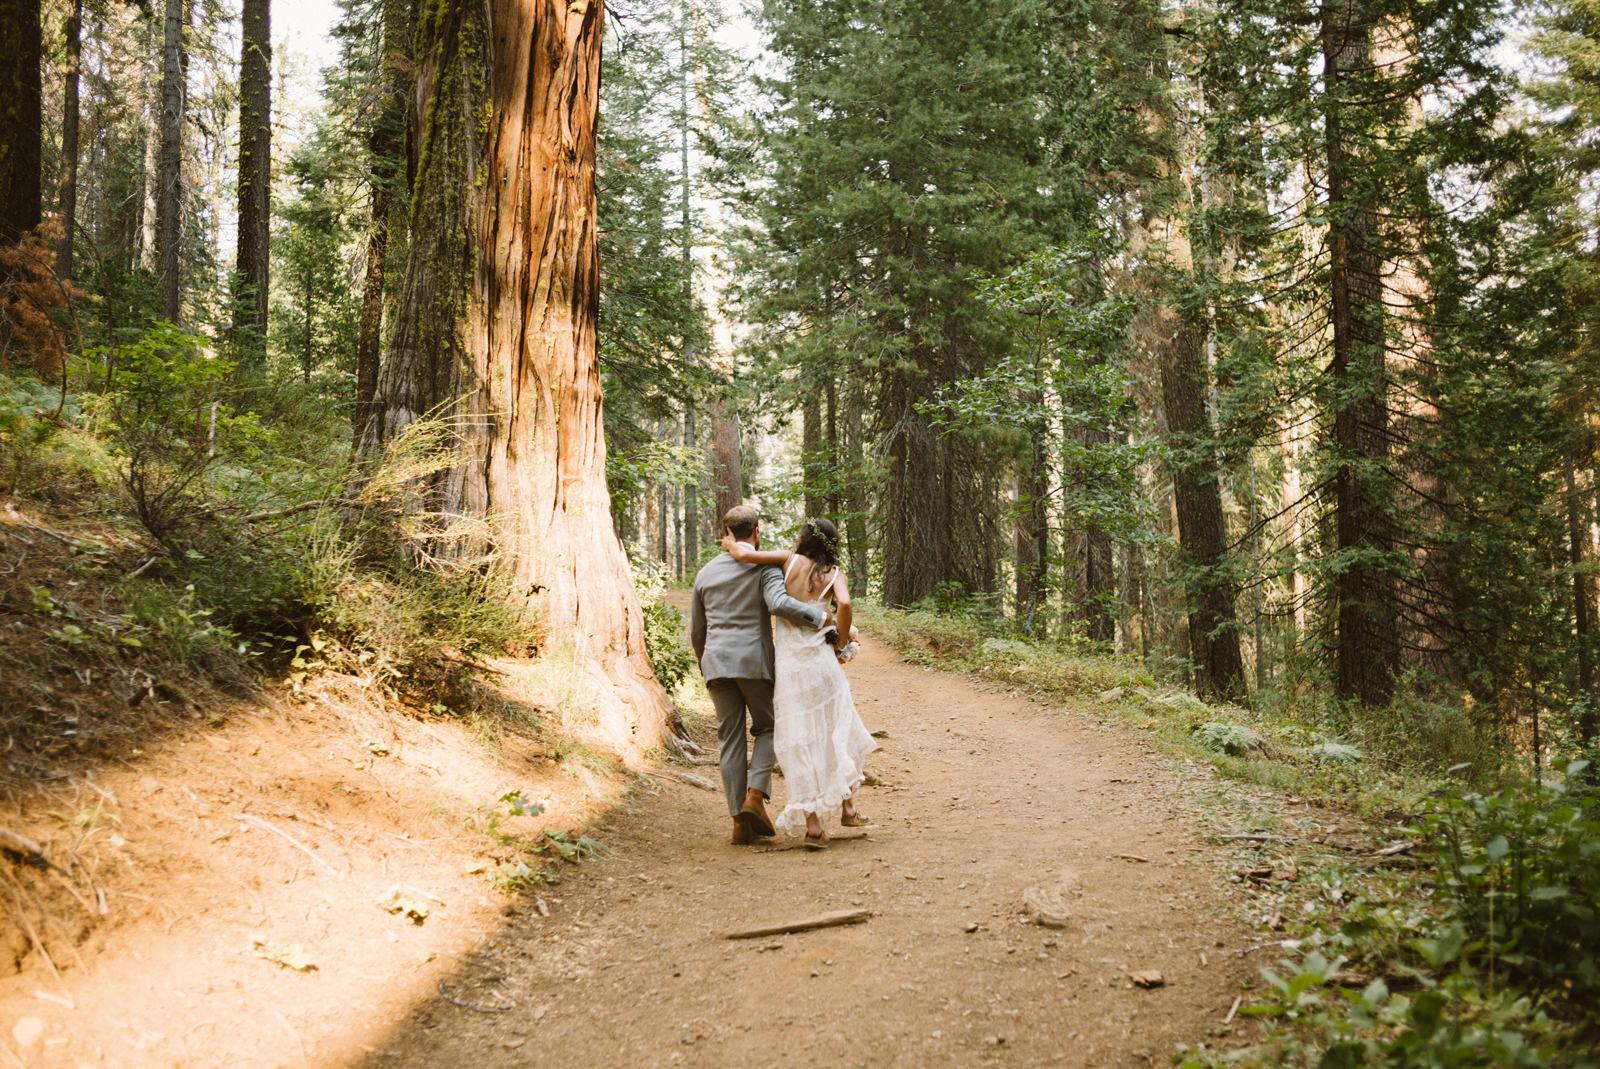 yosemite-intimate-wedding-070 YOSEMITE INTIMATE WEDDING